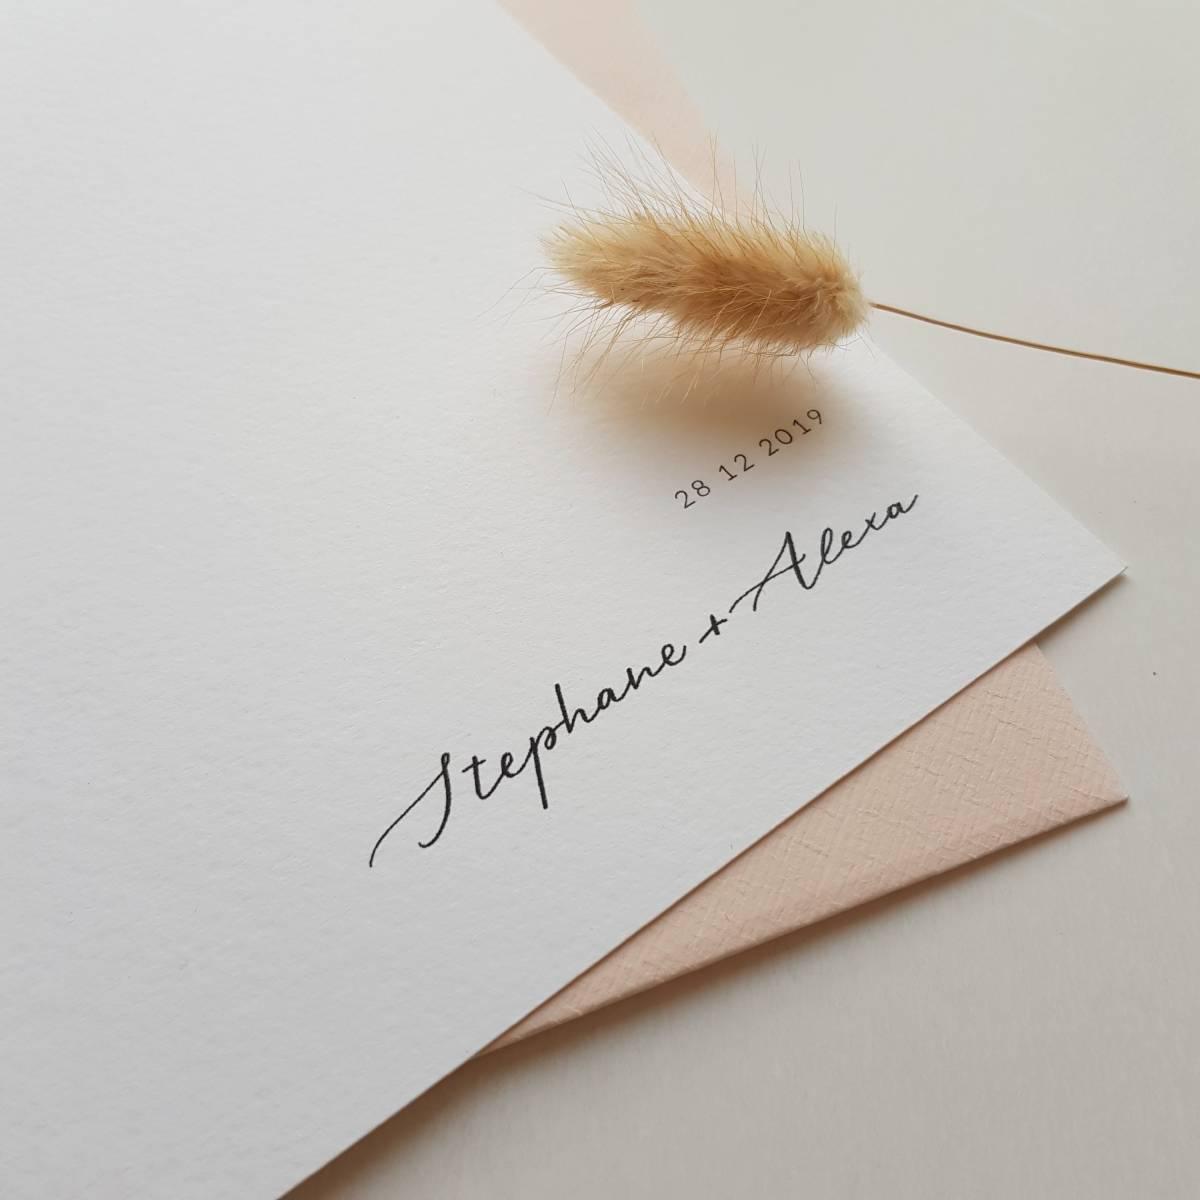 Touch of Gold - Trouwuitnodiging - Huwelijksuitnodiging - Kalligrafie - House of Weddings - 17